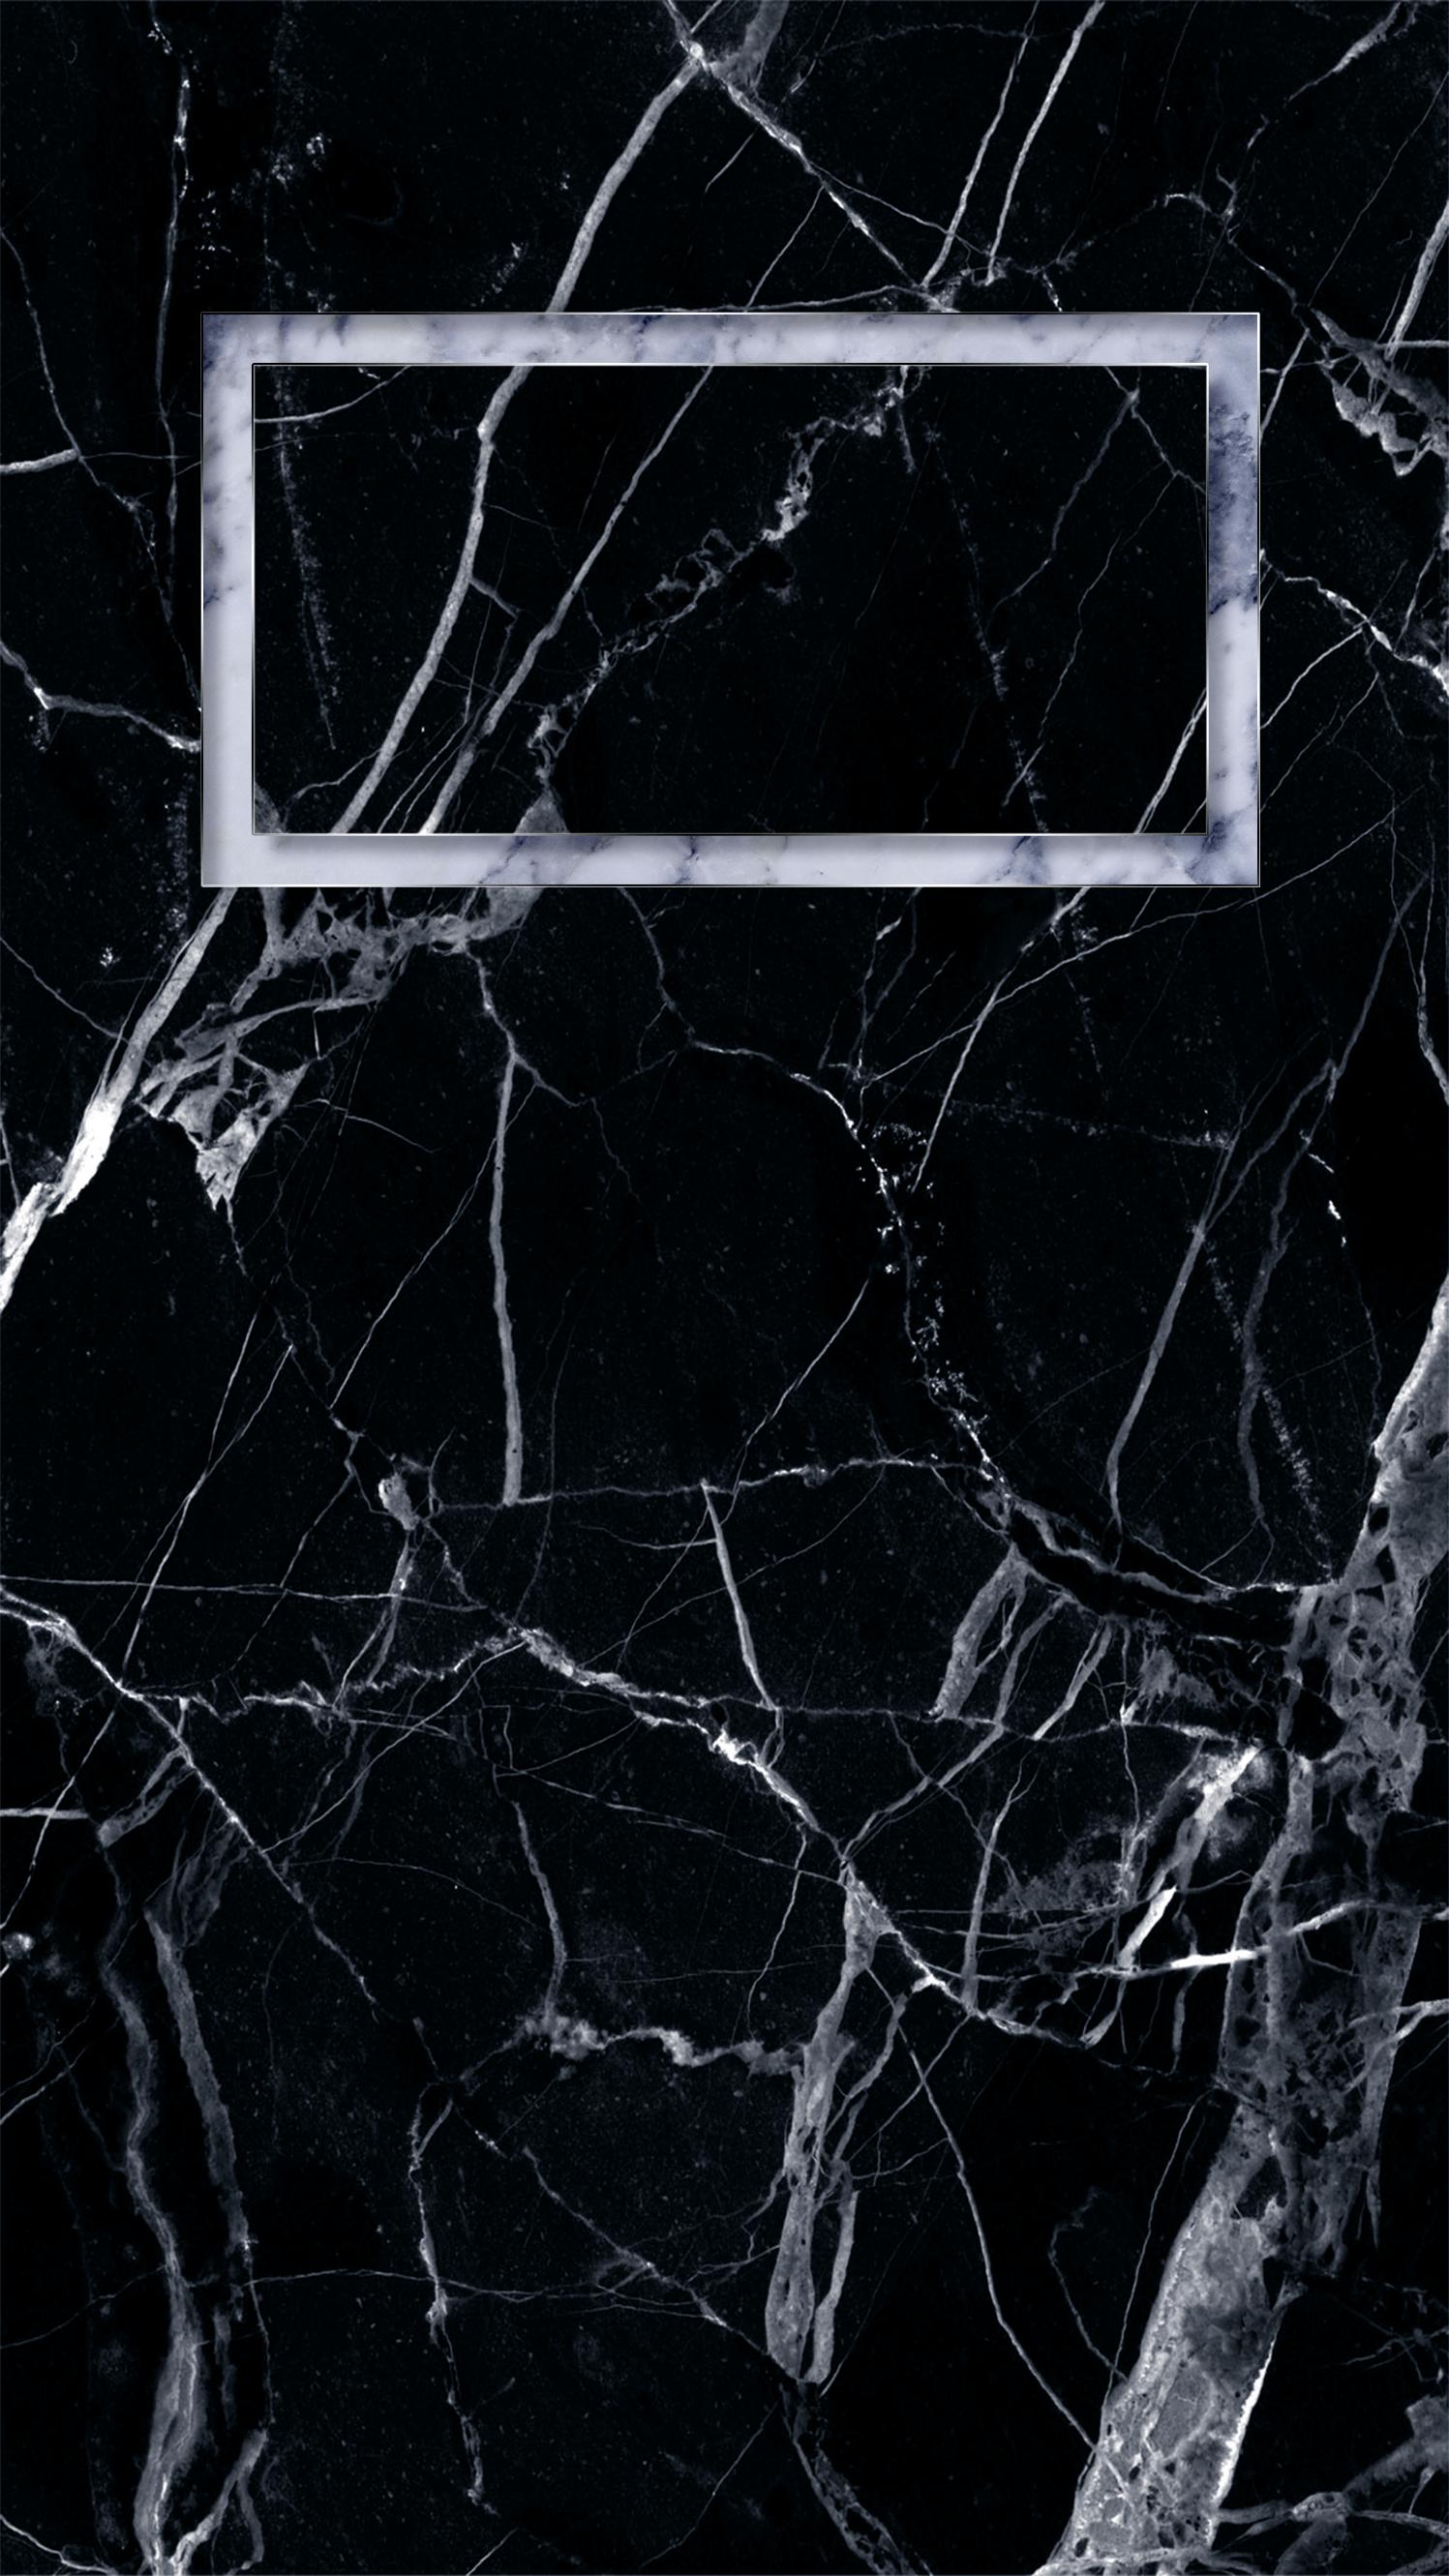 Iphone Lock Screen Wallpapers Top Free Iphone Lock Screen Backgrounds Wallpaperaccess